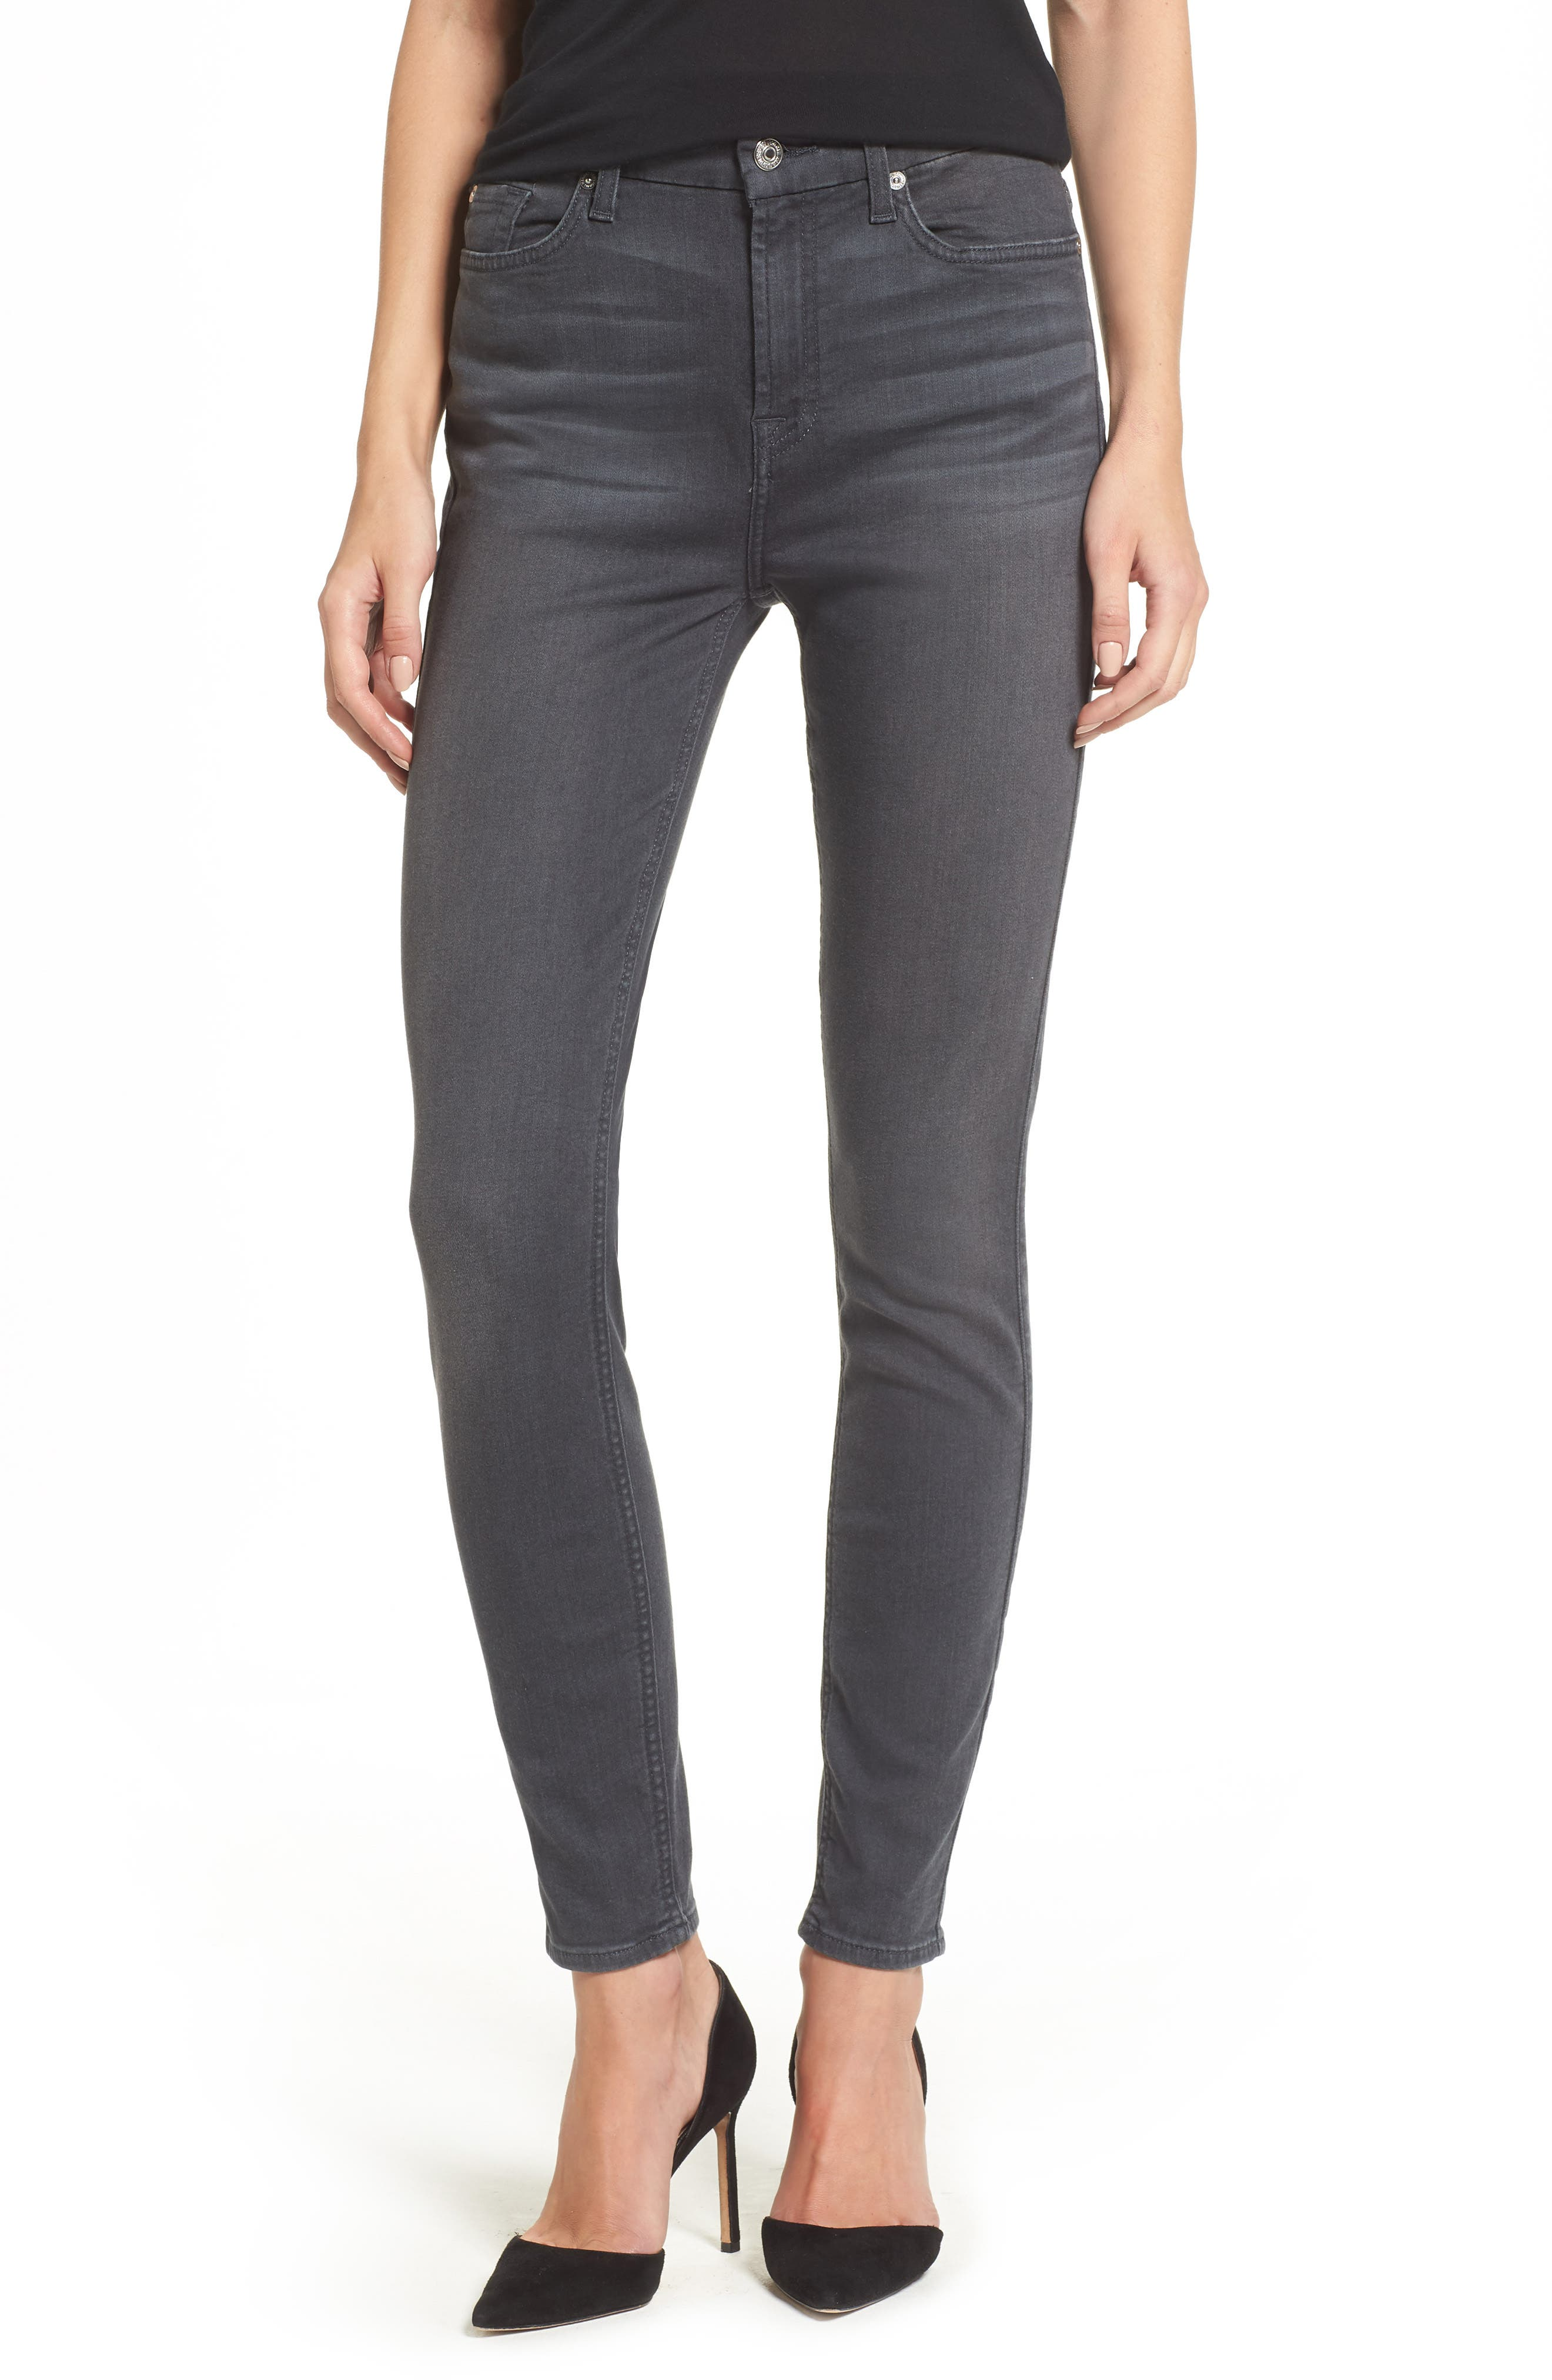 b(air) High Waist Skinny Jeans,                         Main,                         color, B(Air) Smoke